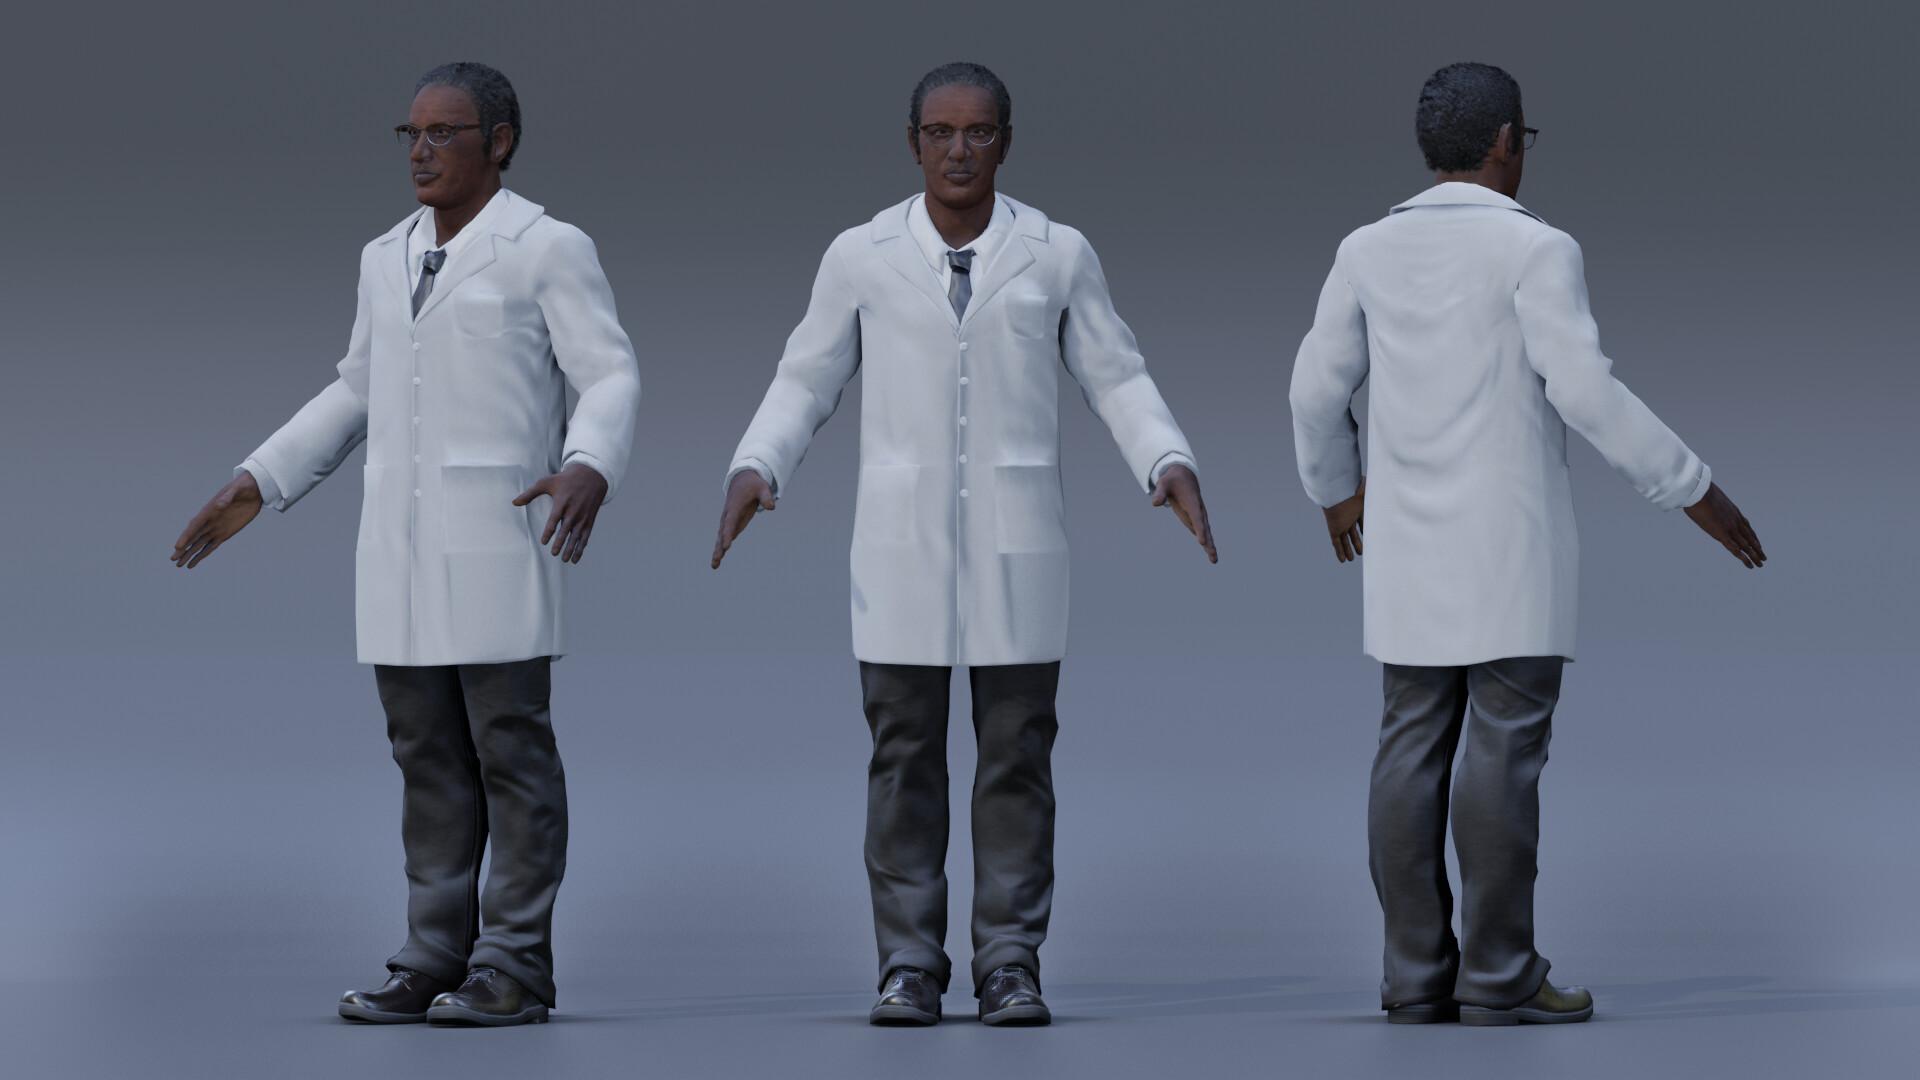 Dr. Alviston